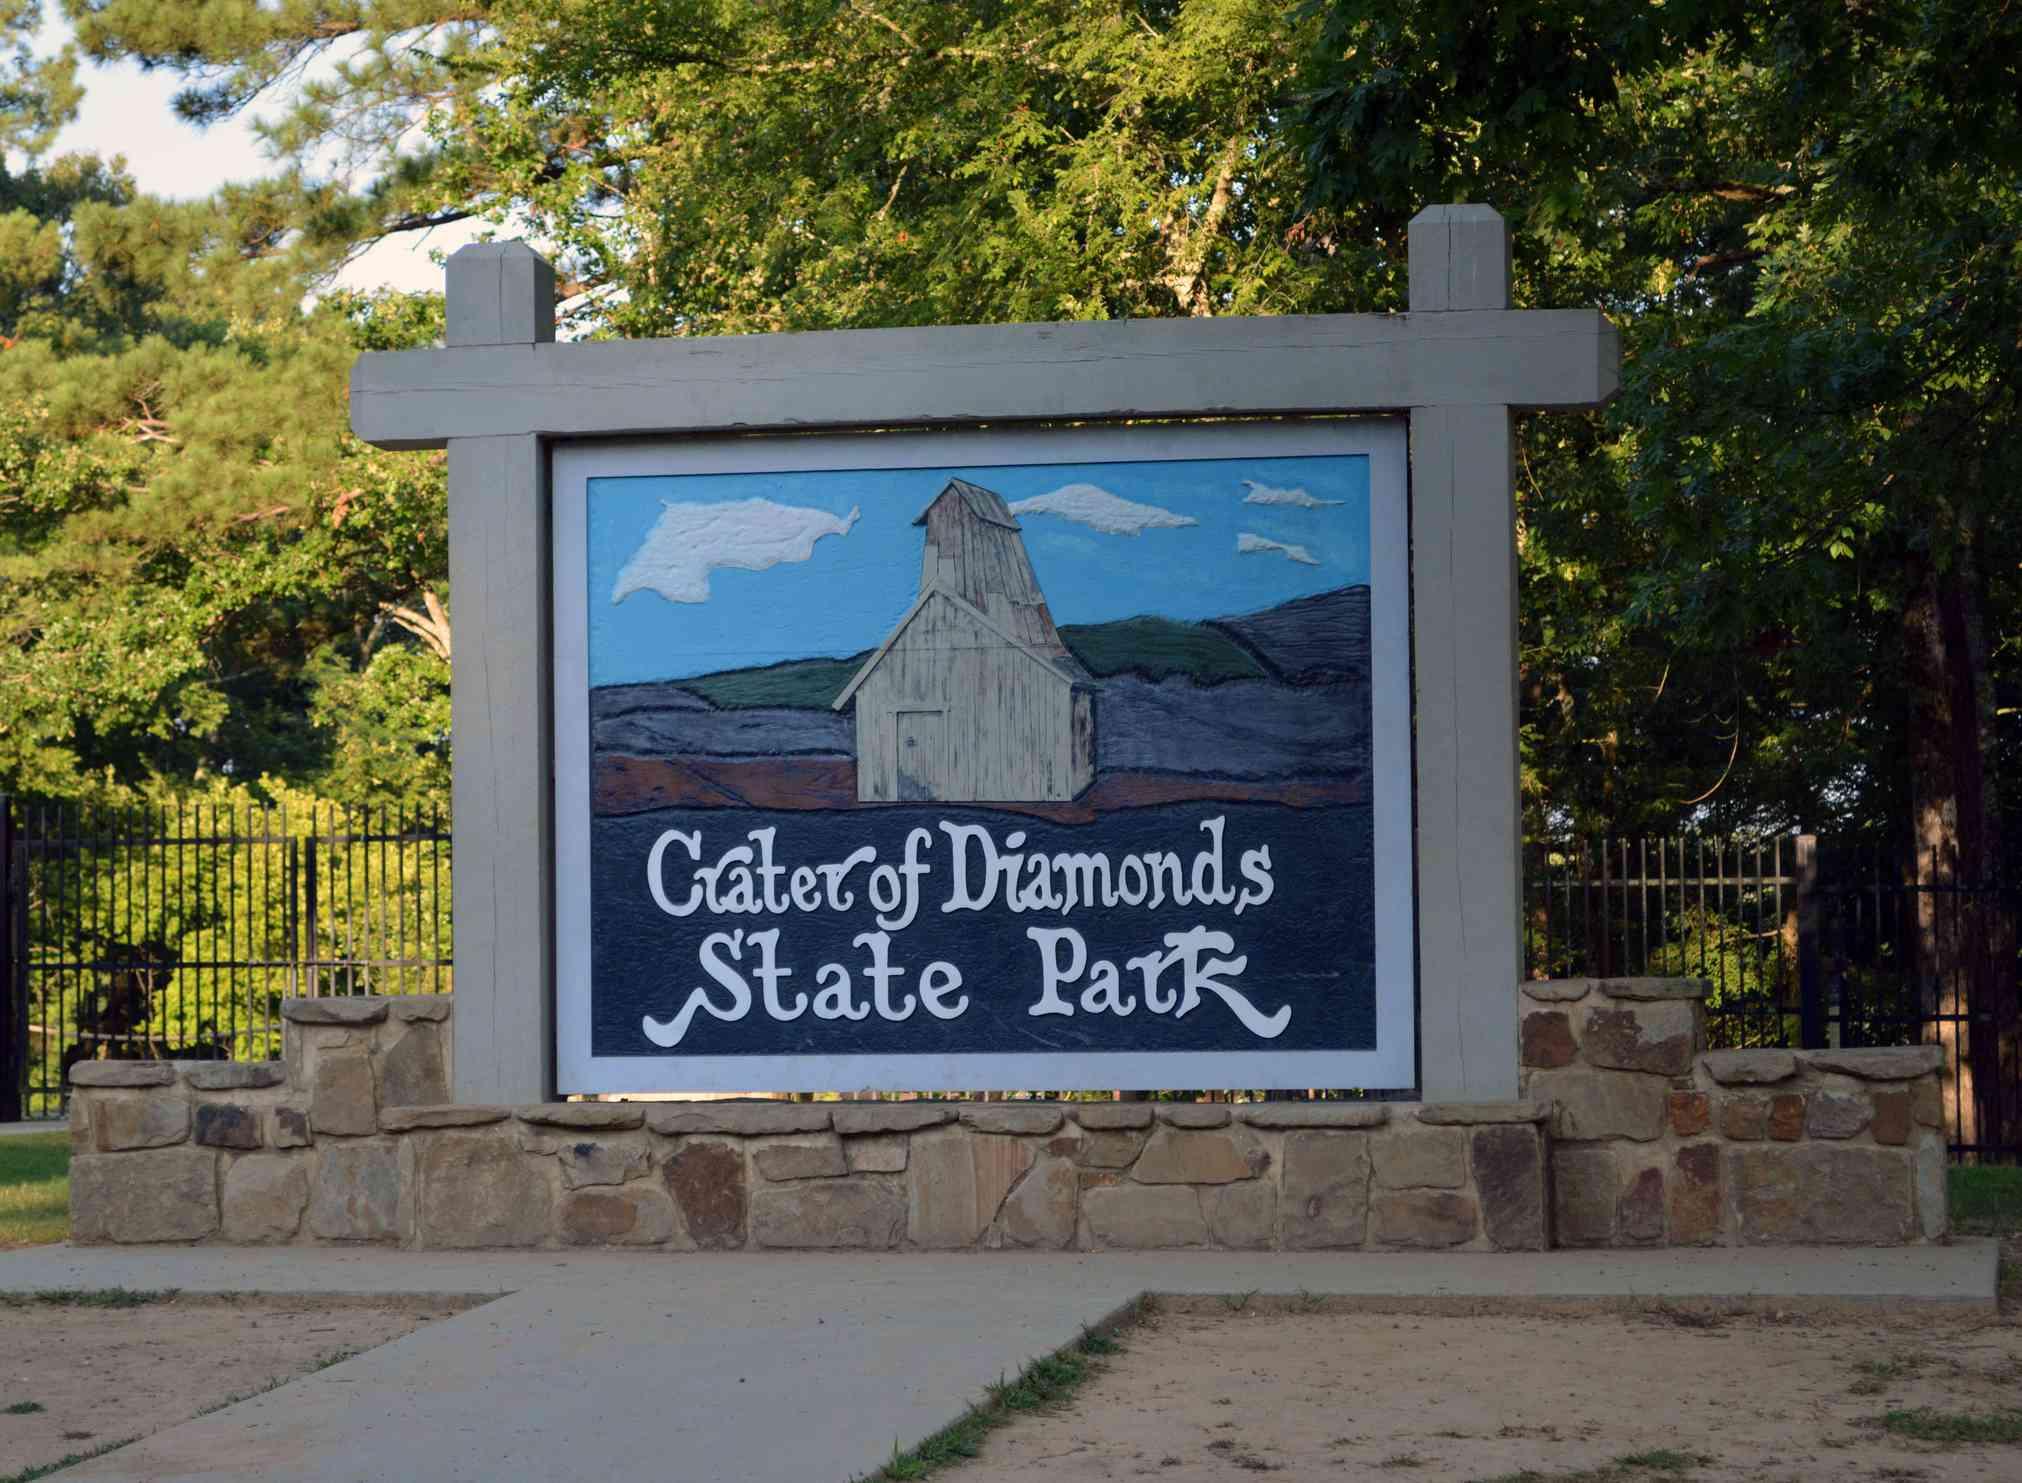 Crater of Diamonds State Park, Arkansas